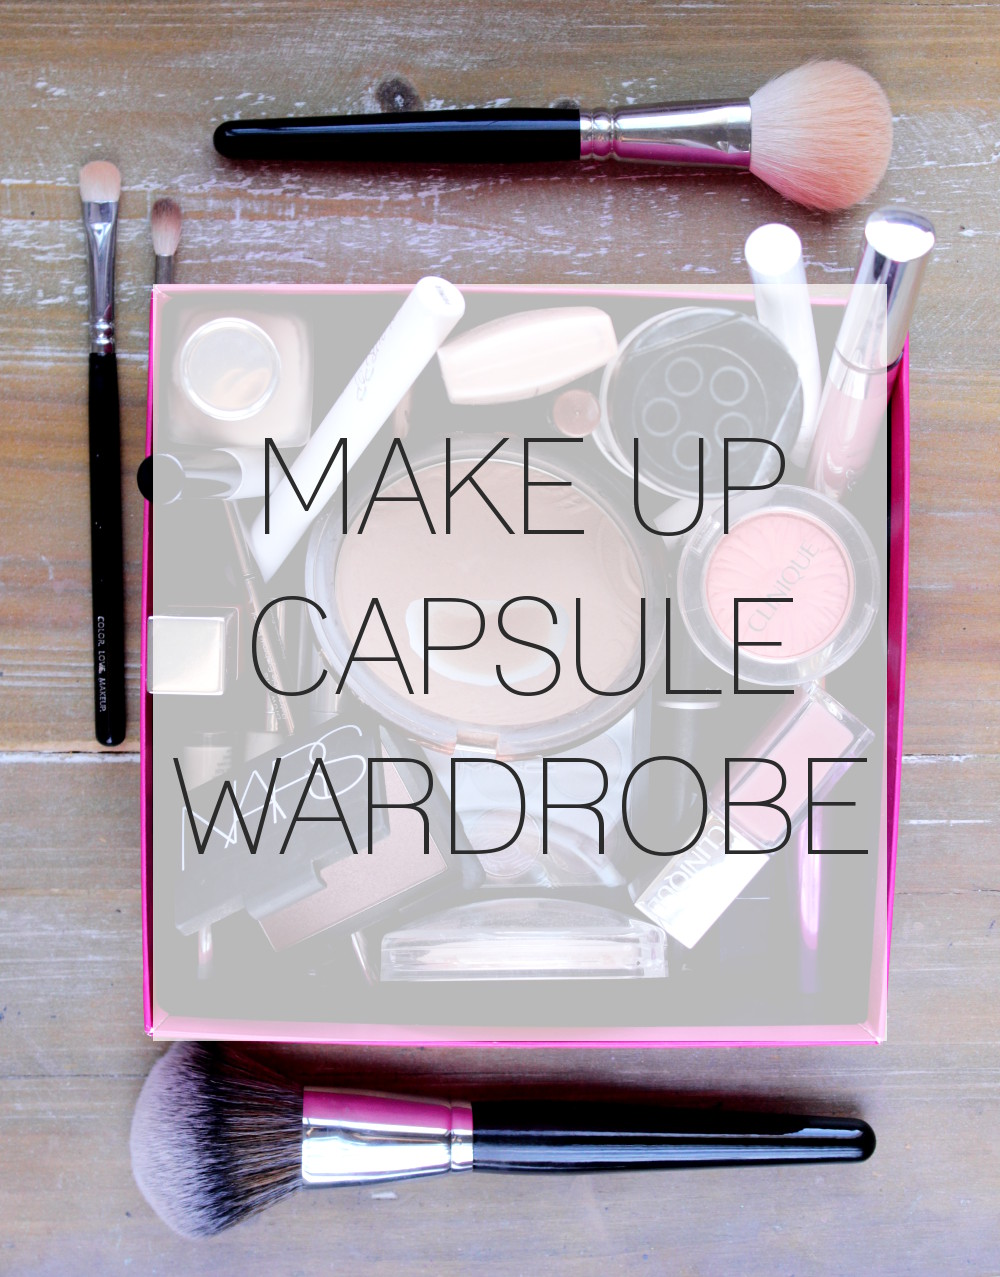 Make Up Capsule Wardrobe